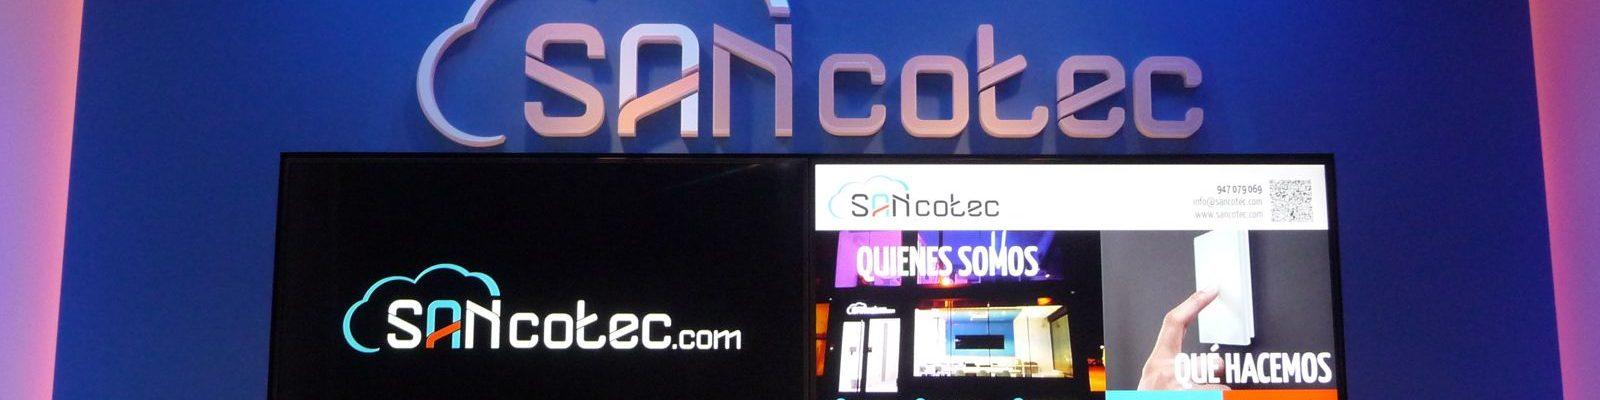 SANcotec-Audiovisuales